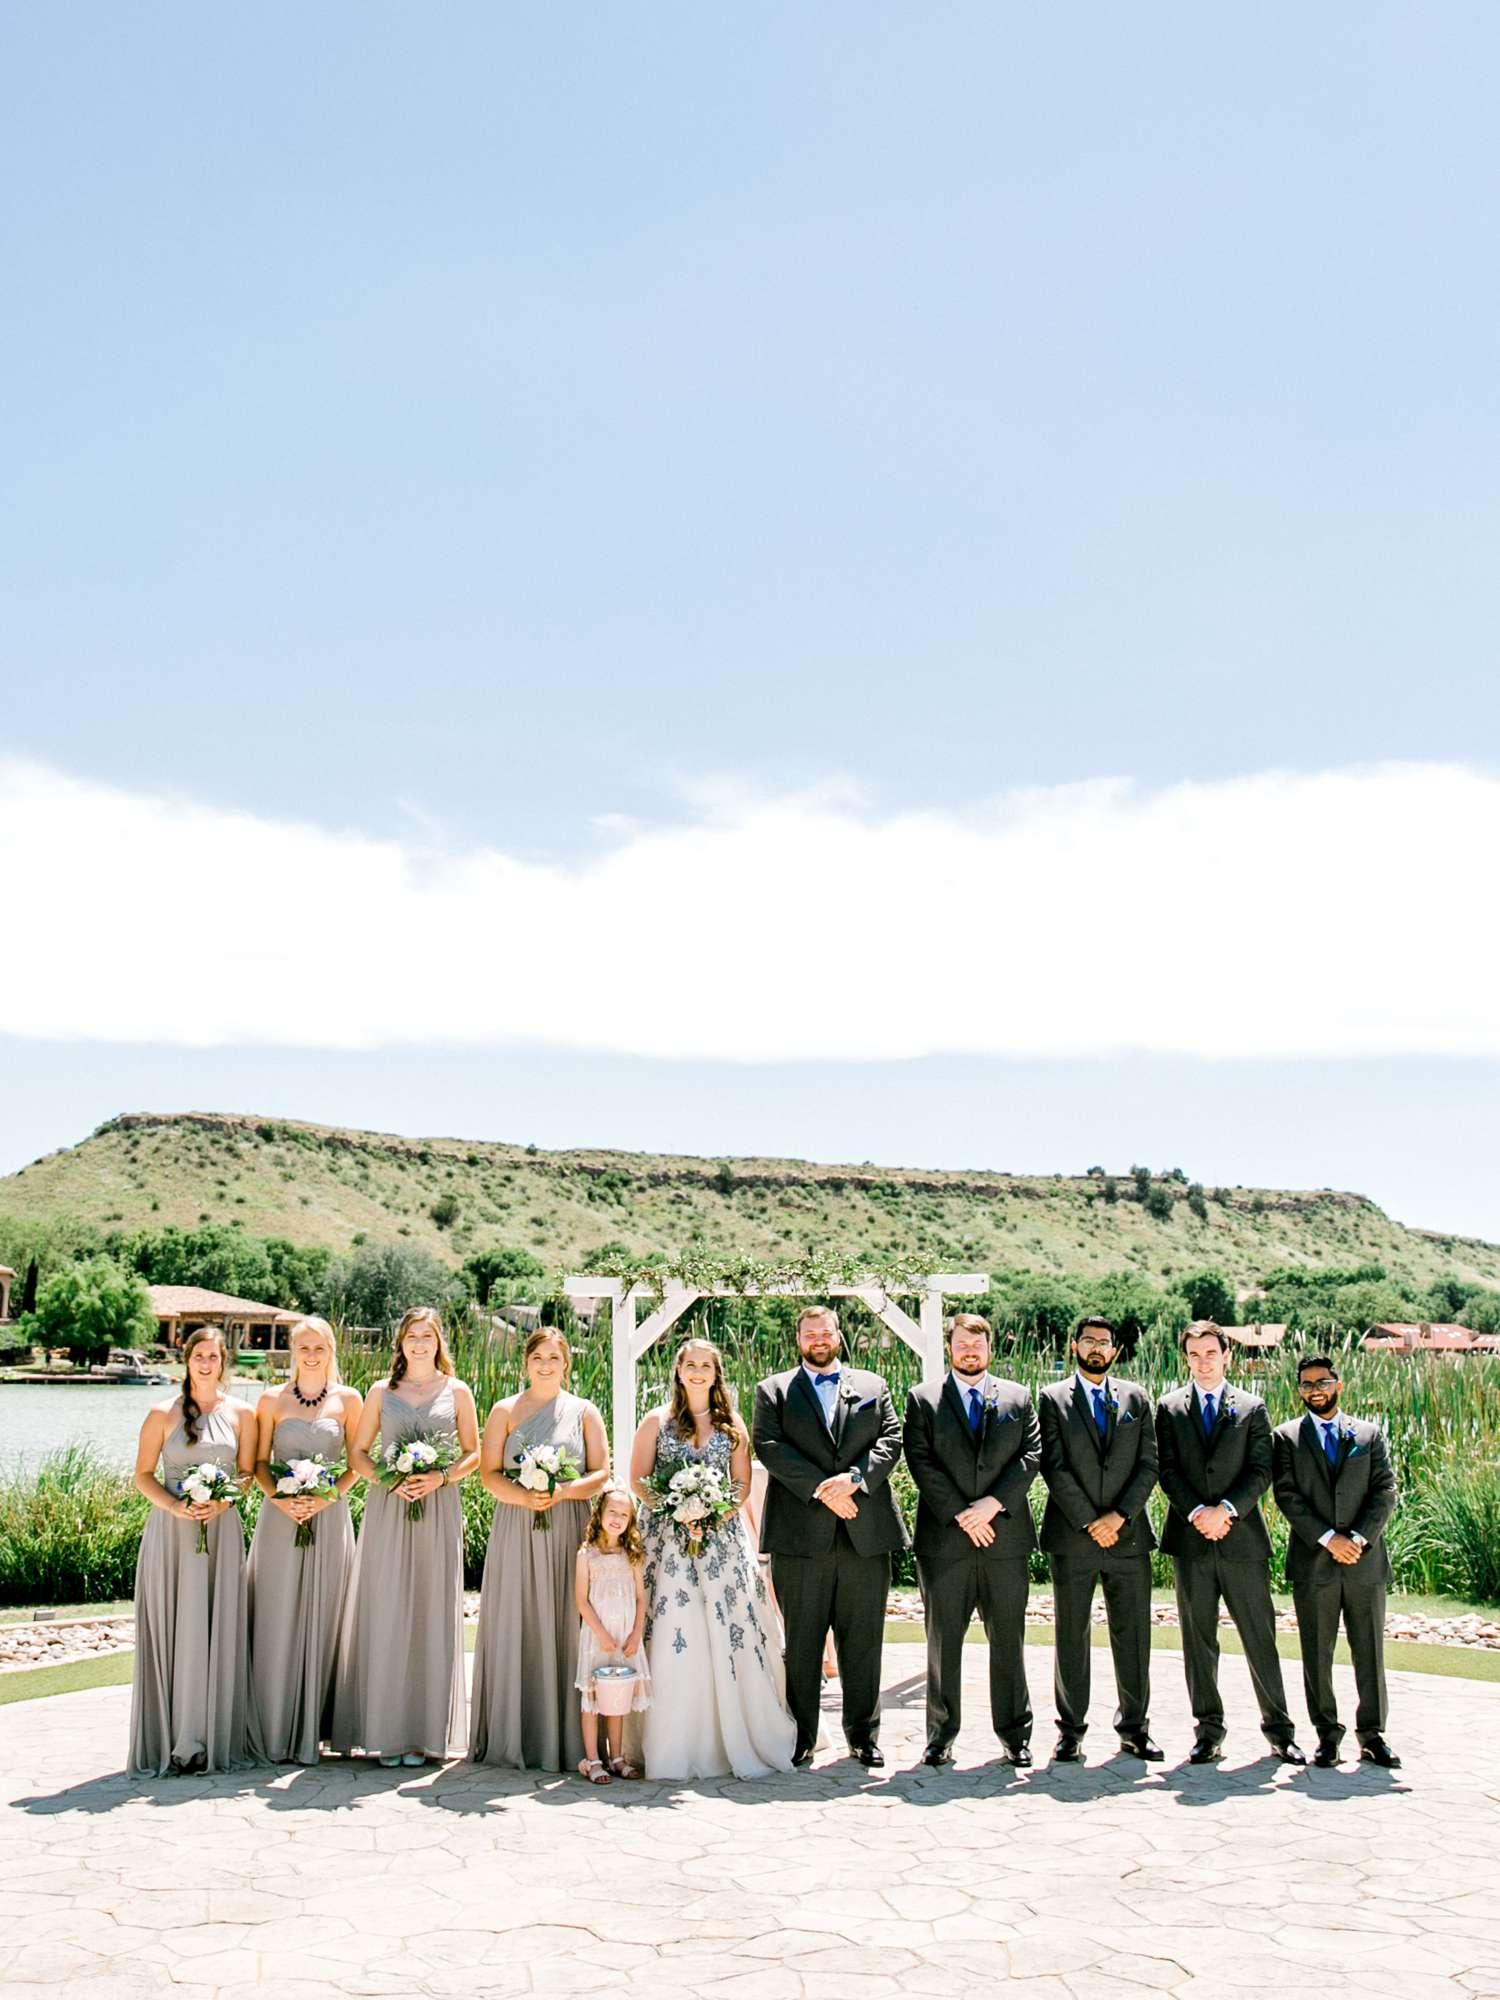 TY+NATHAN+HALLIER+ALLEEJ+WEDDING+PHOTOGRAPHER+RANSOM+CANYON_0047.jpg